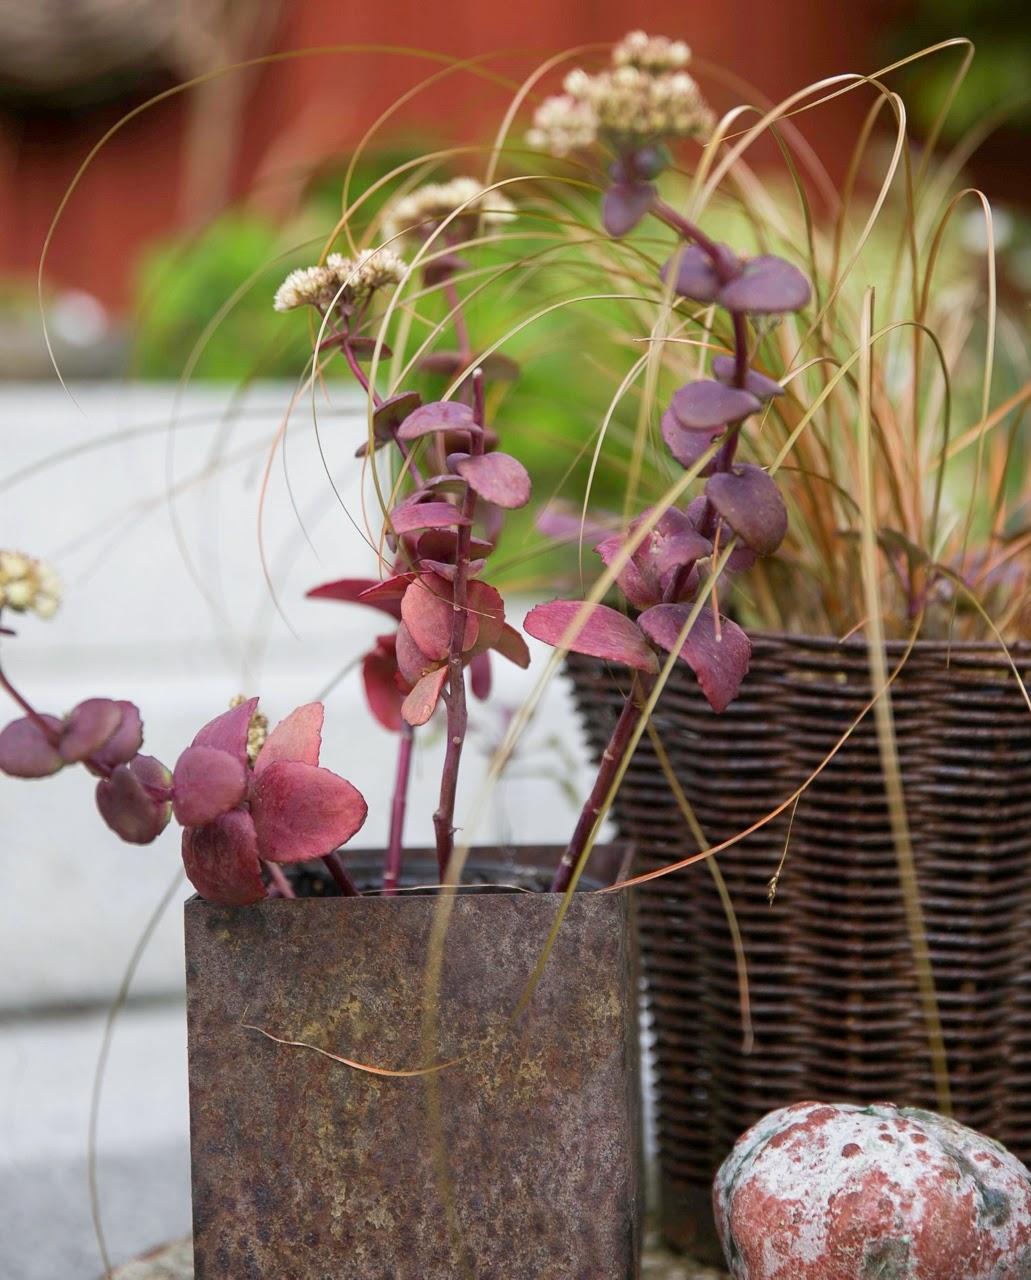 Glädjekällans trädgårdsblogg: augusti 2014